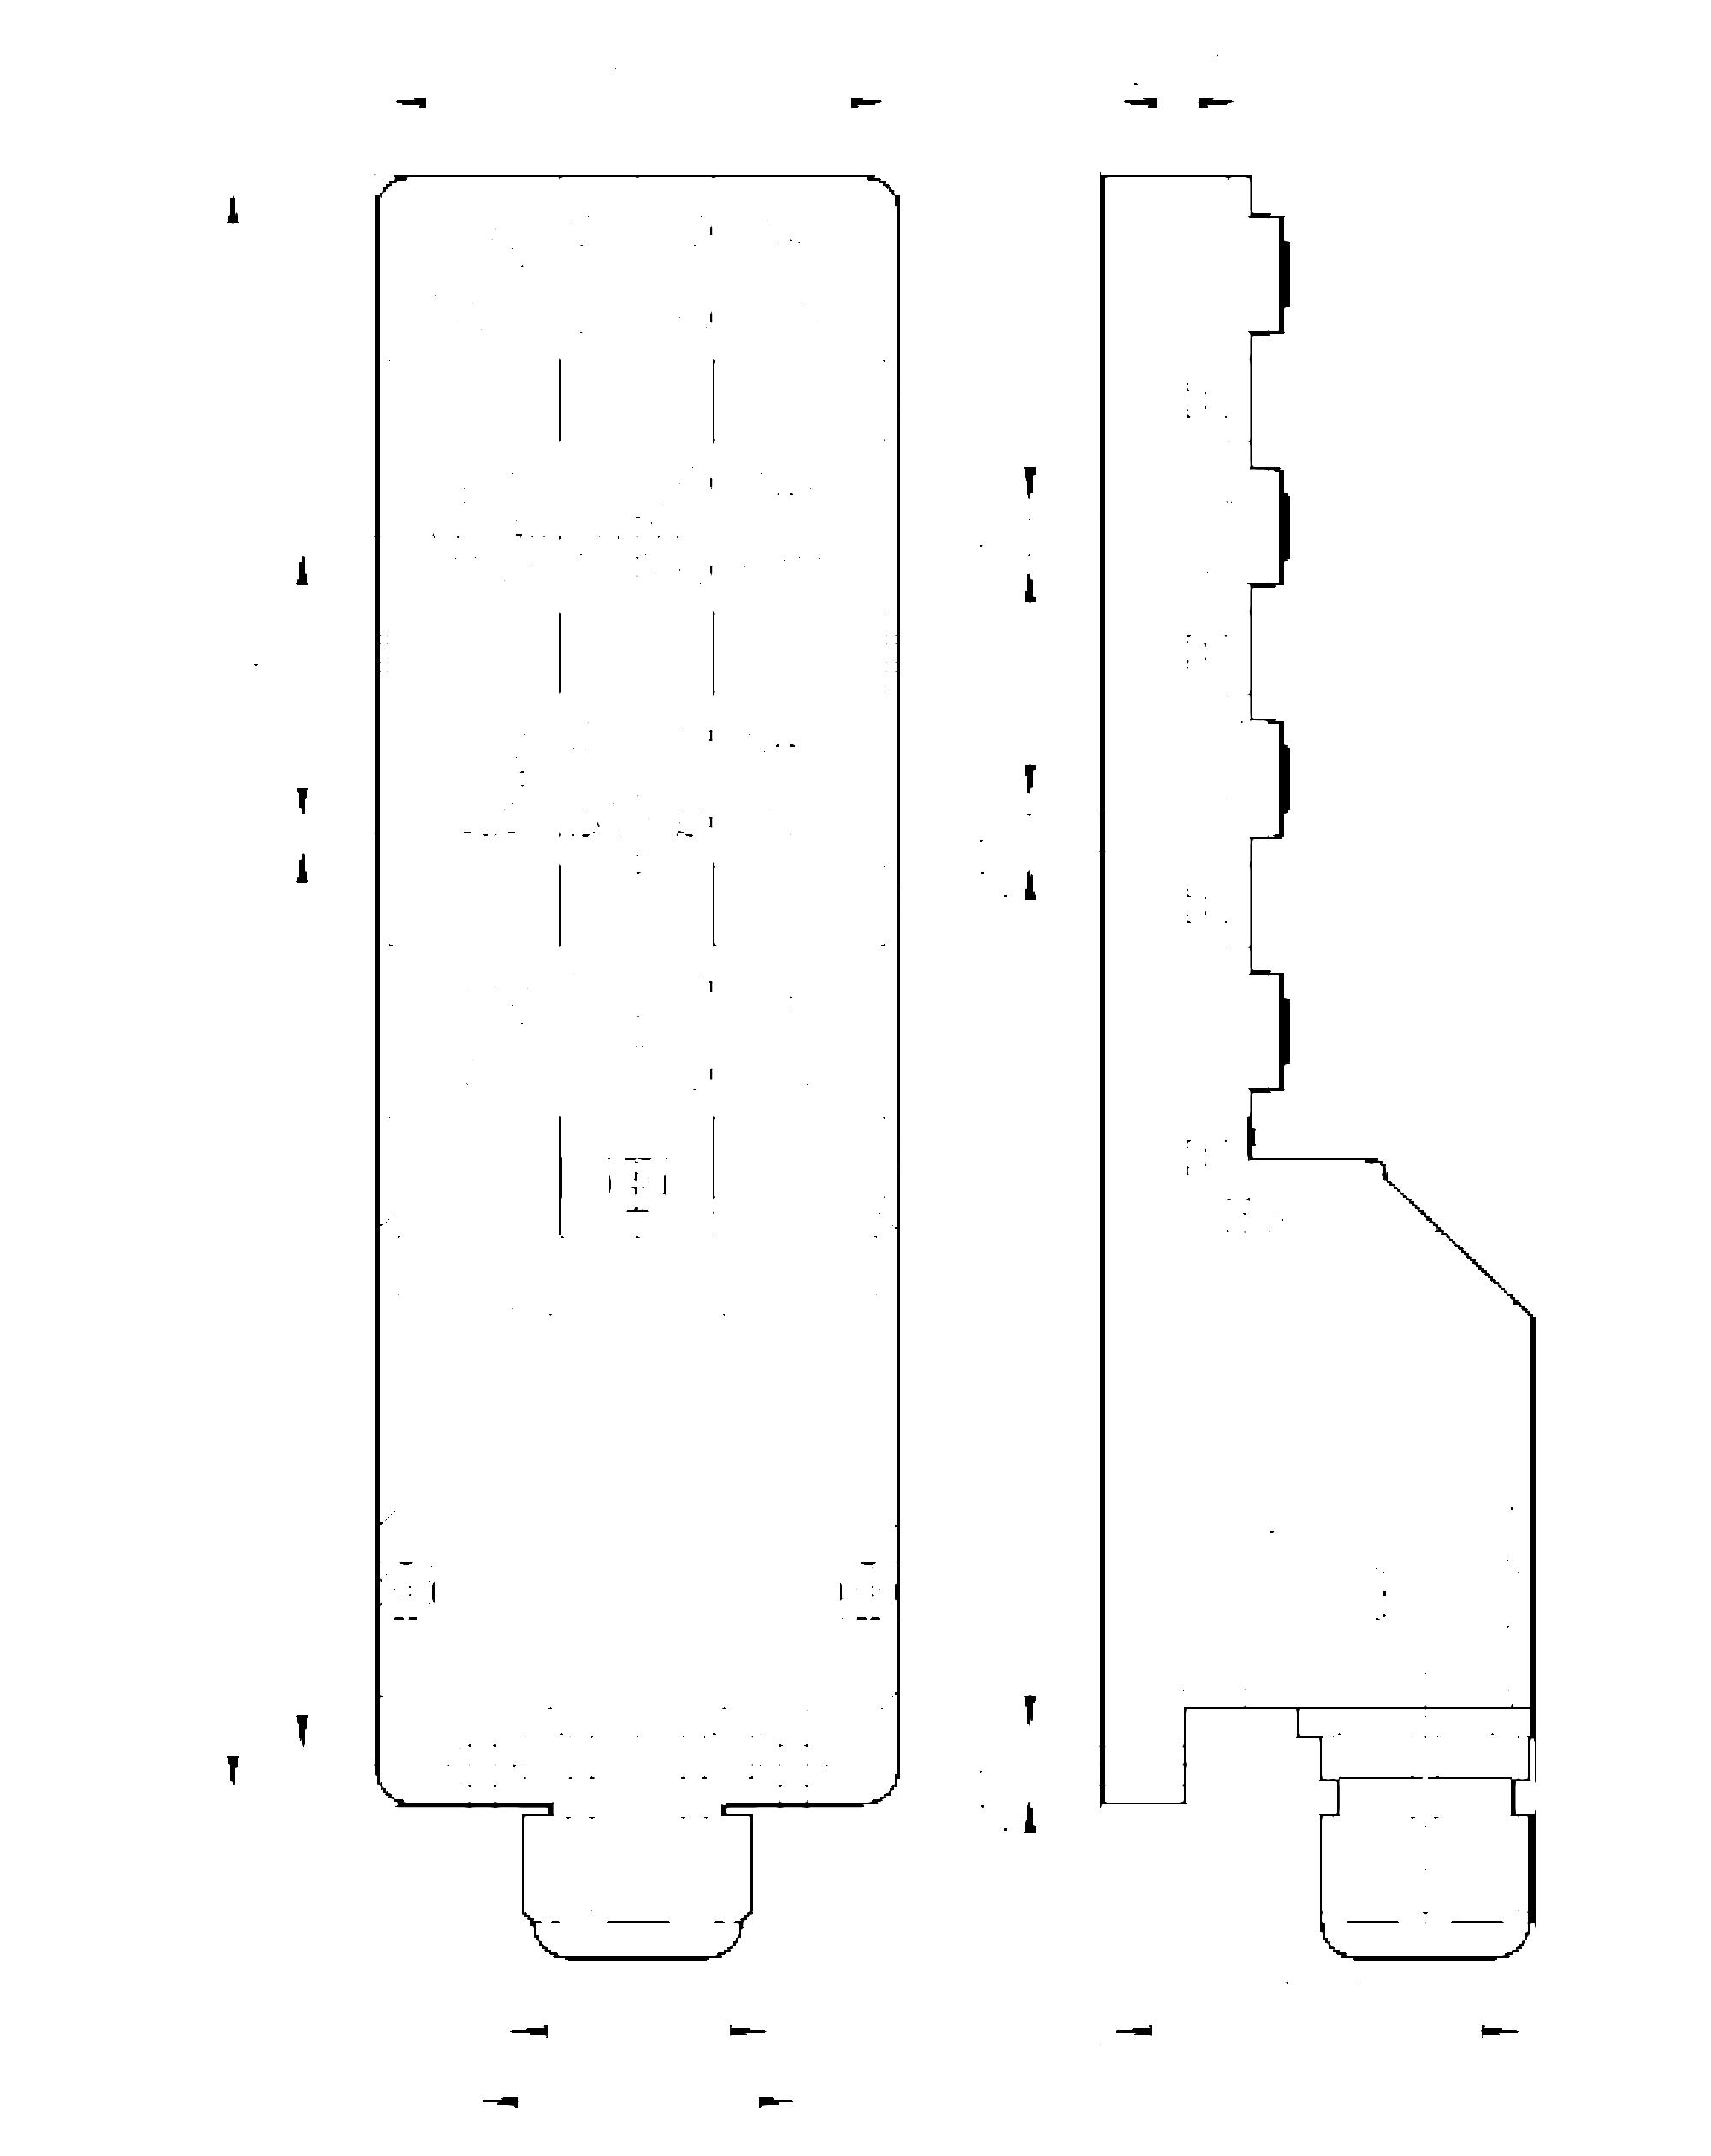 ebt005 - wiring block